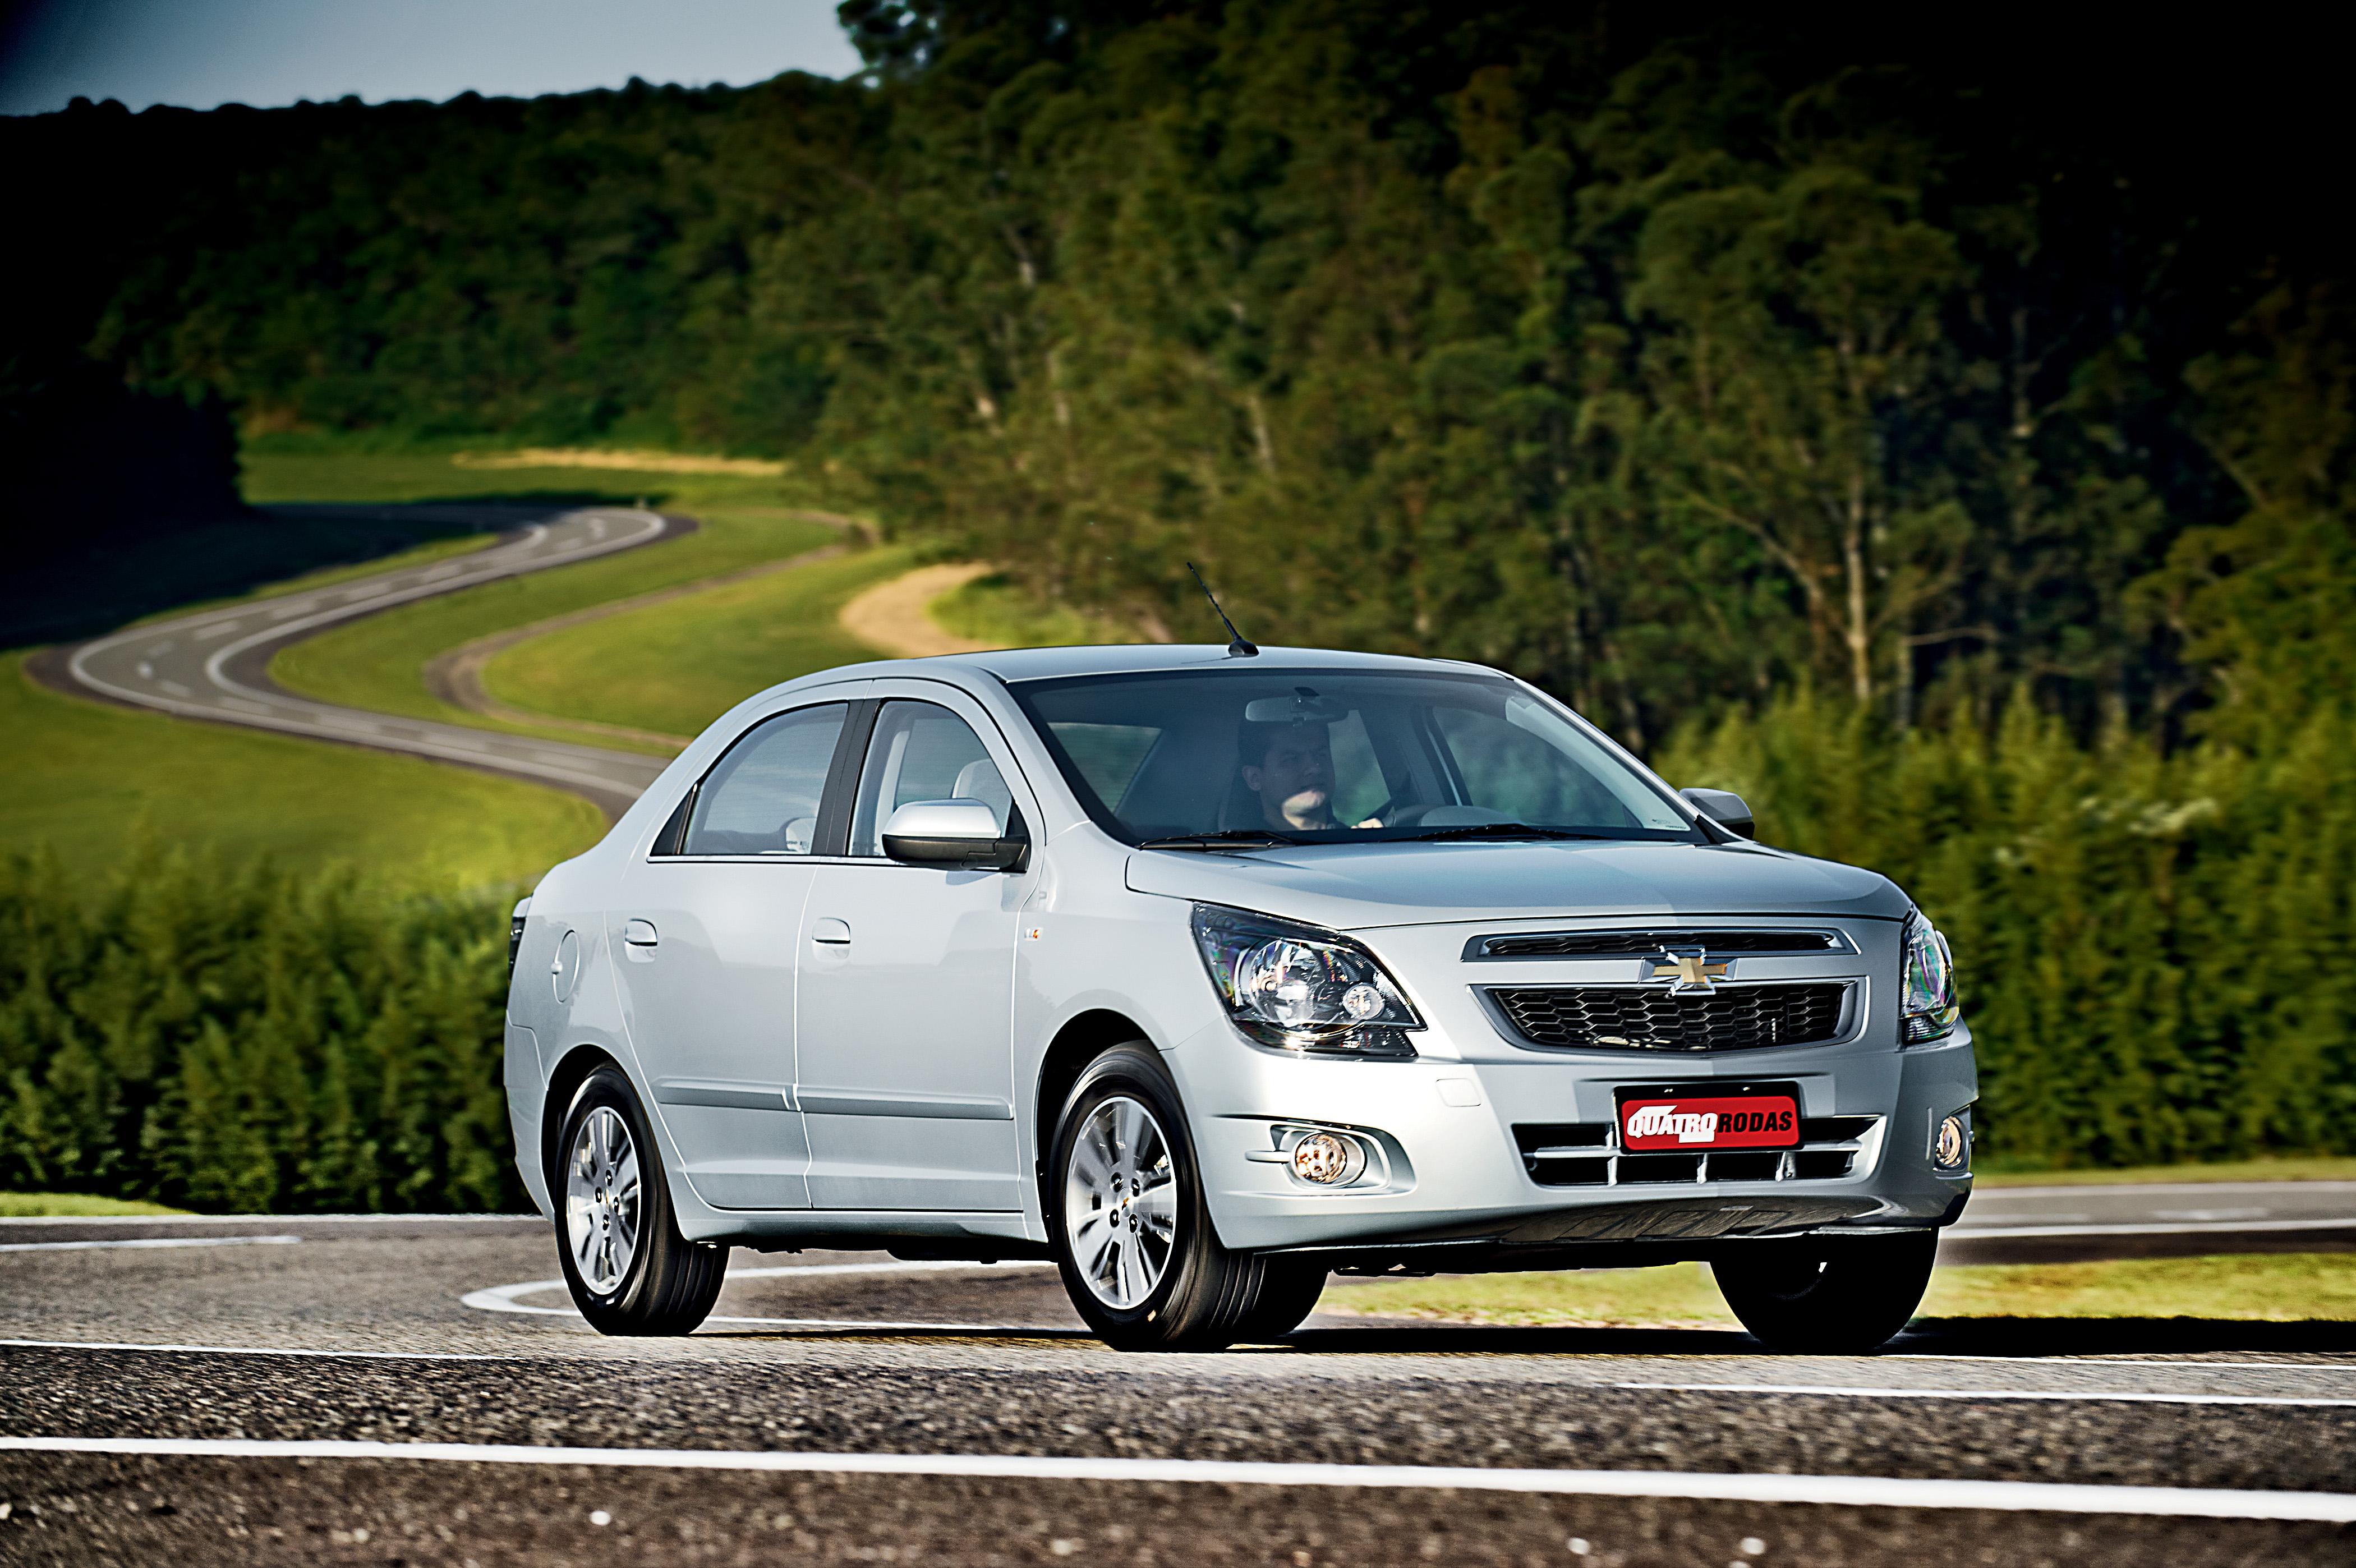 Chevrolet Cobalt LTZ 2012 01